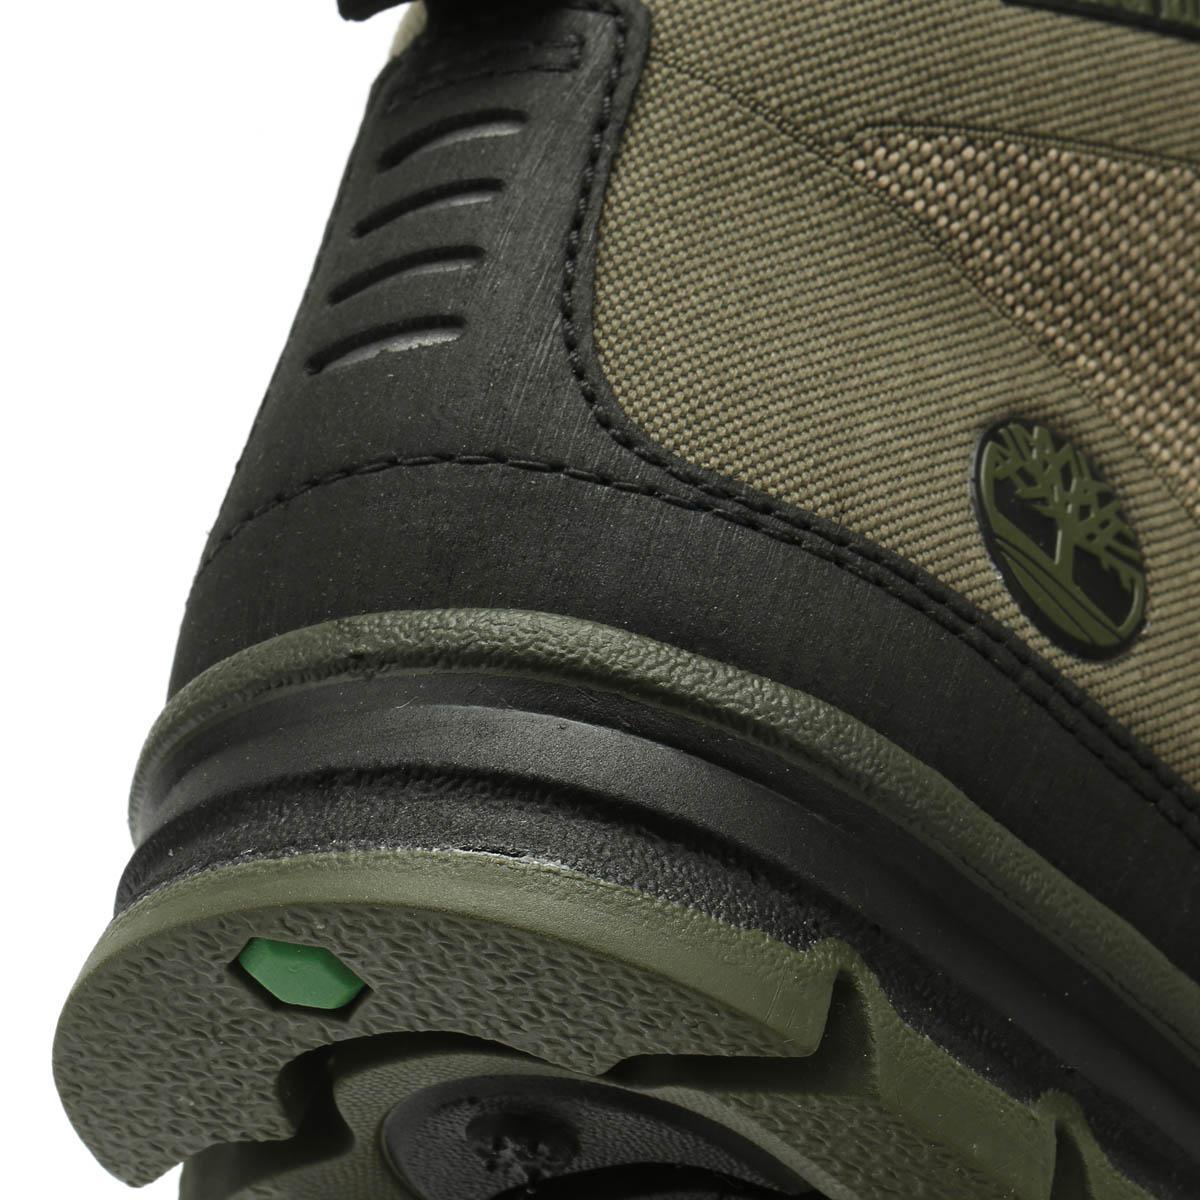 7830553ec98 Men's Euro Hiker Shell Toe Jacquard Shoes Dark Green 2018